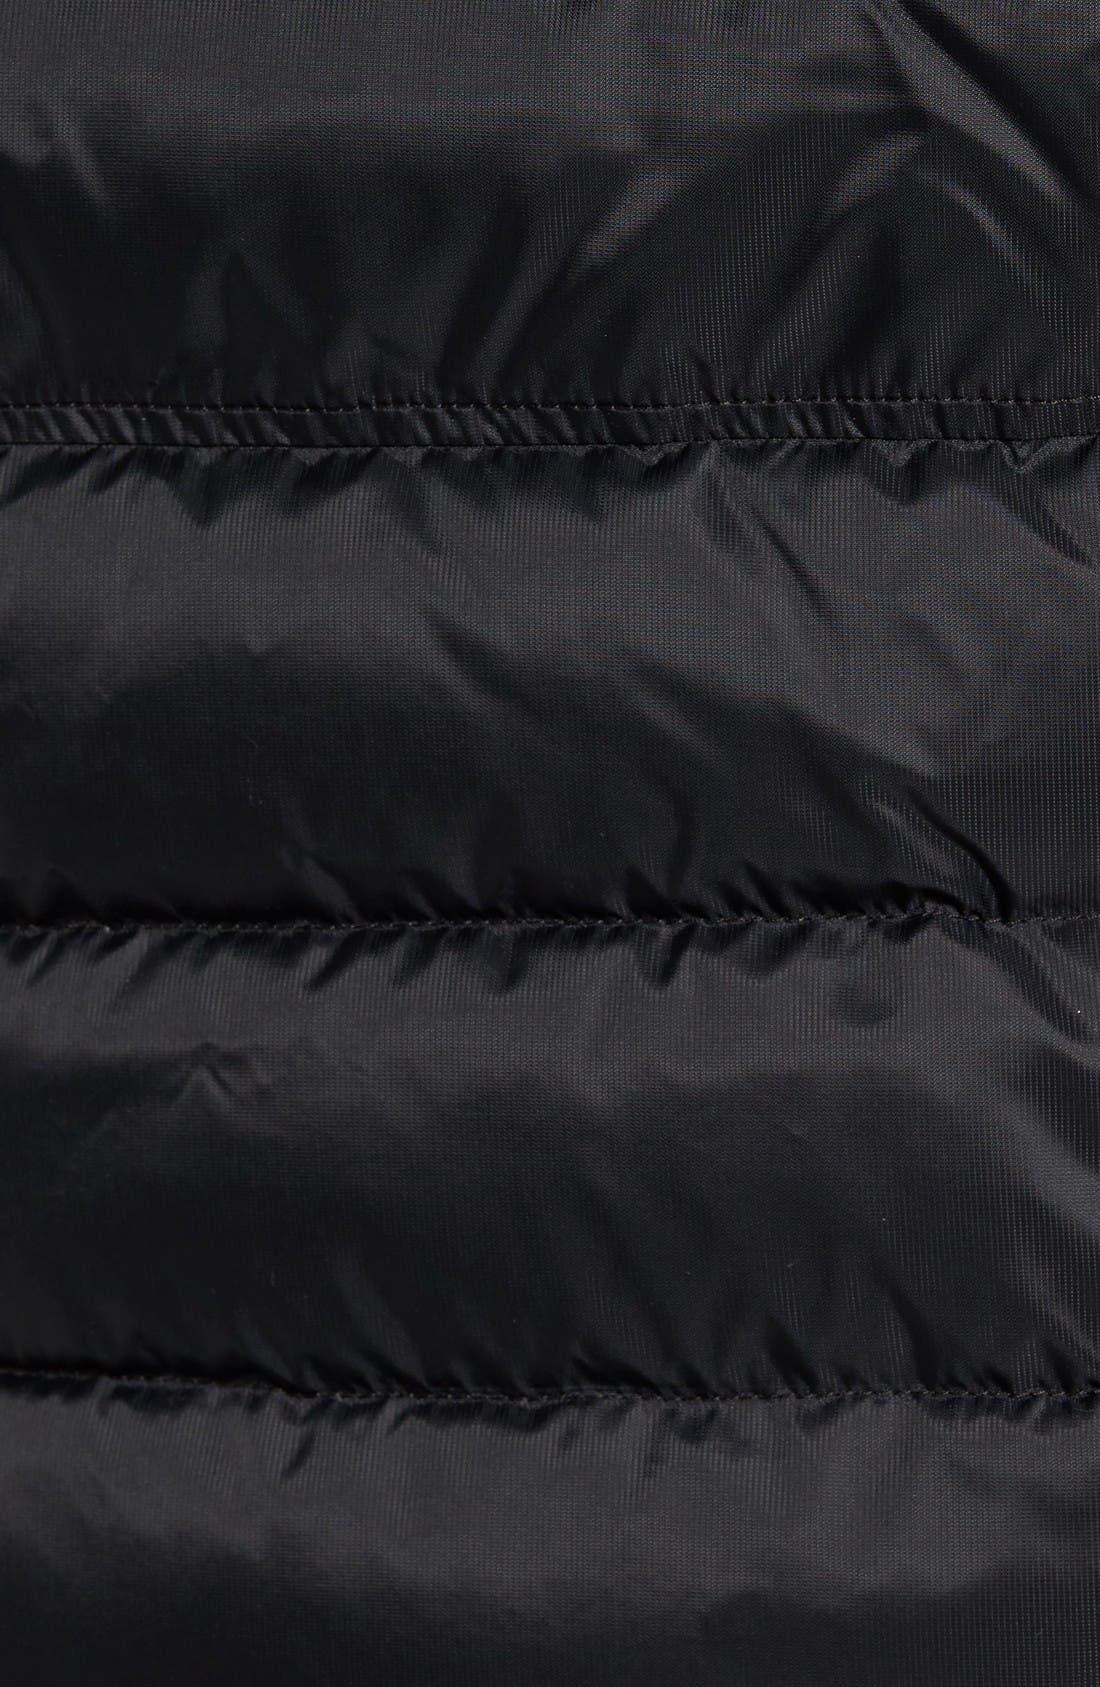 HyBridge Perren Packable Down Jacket,                             Alternate thumbnail 5, color,                             Black